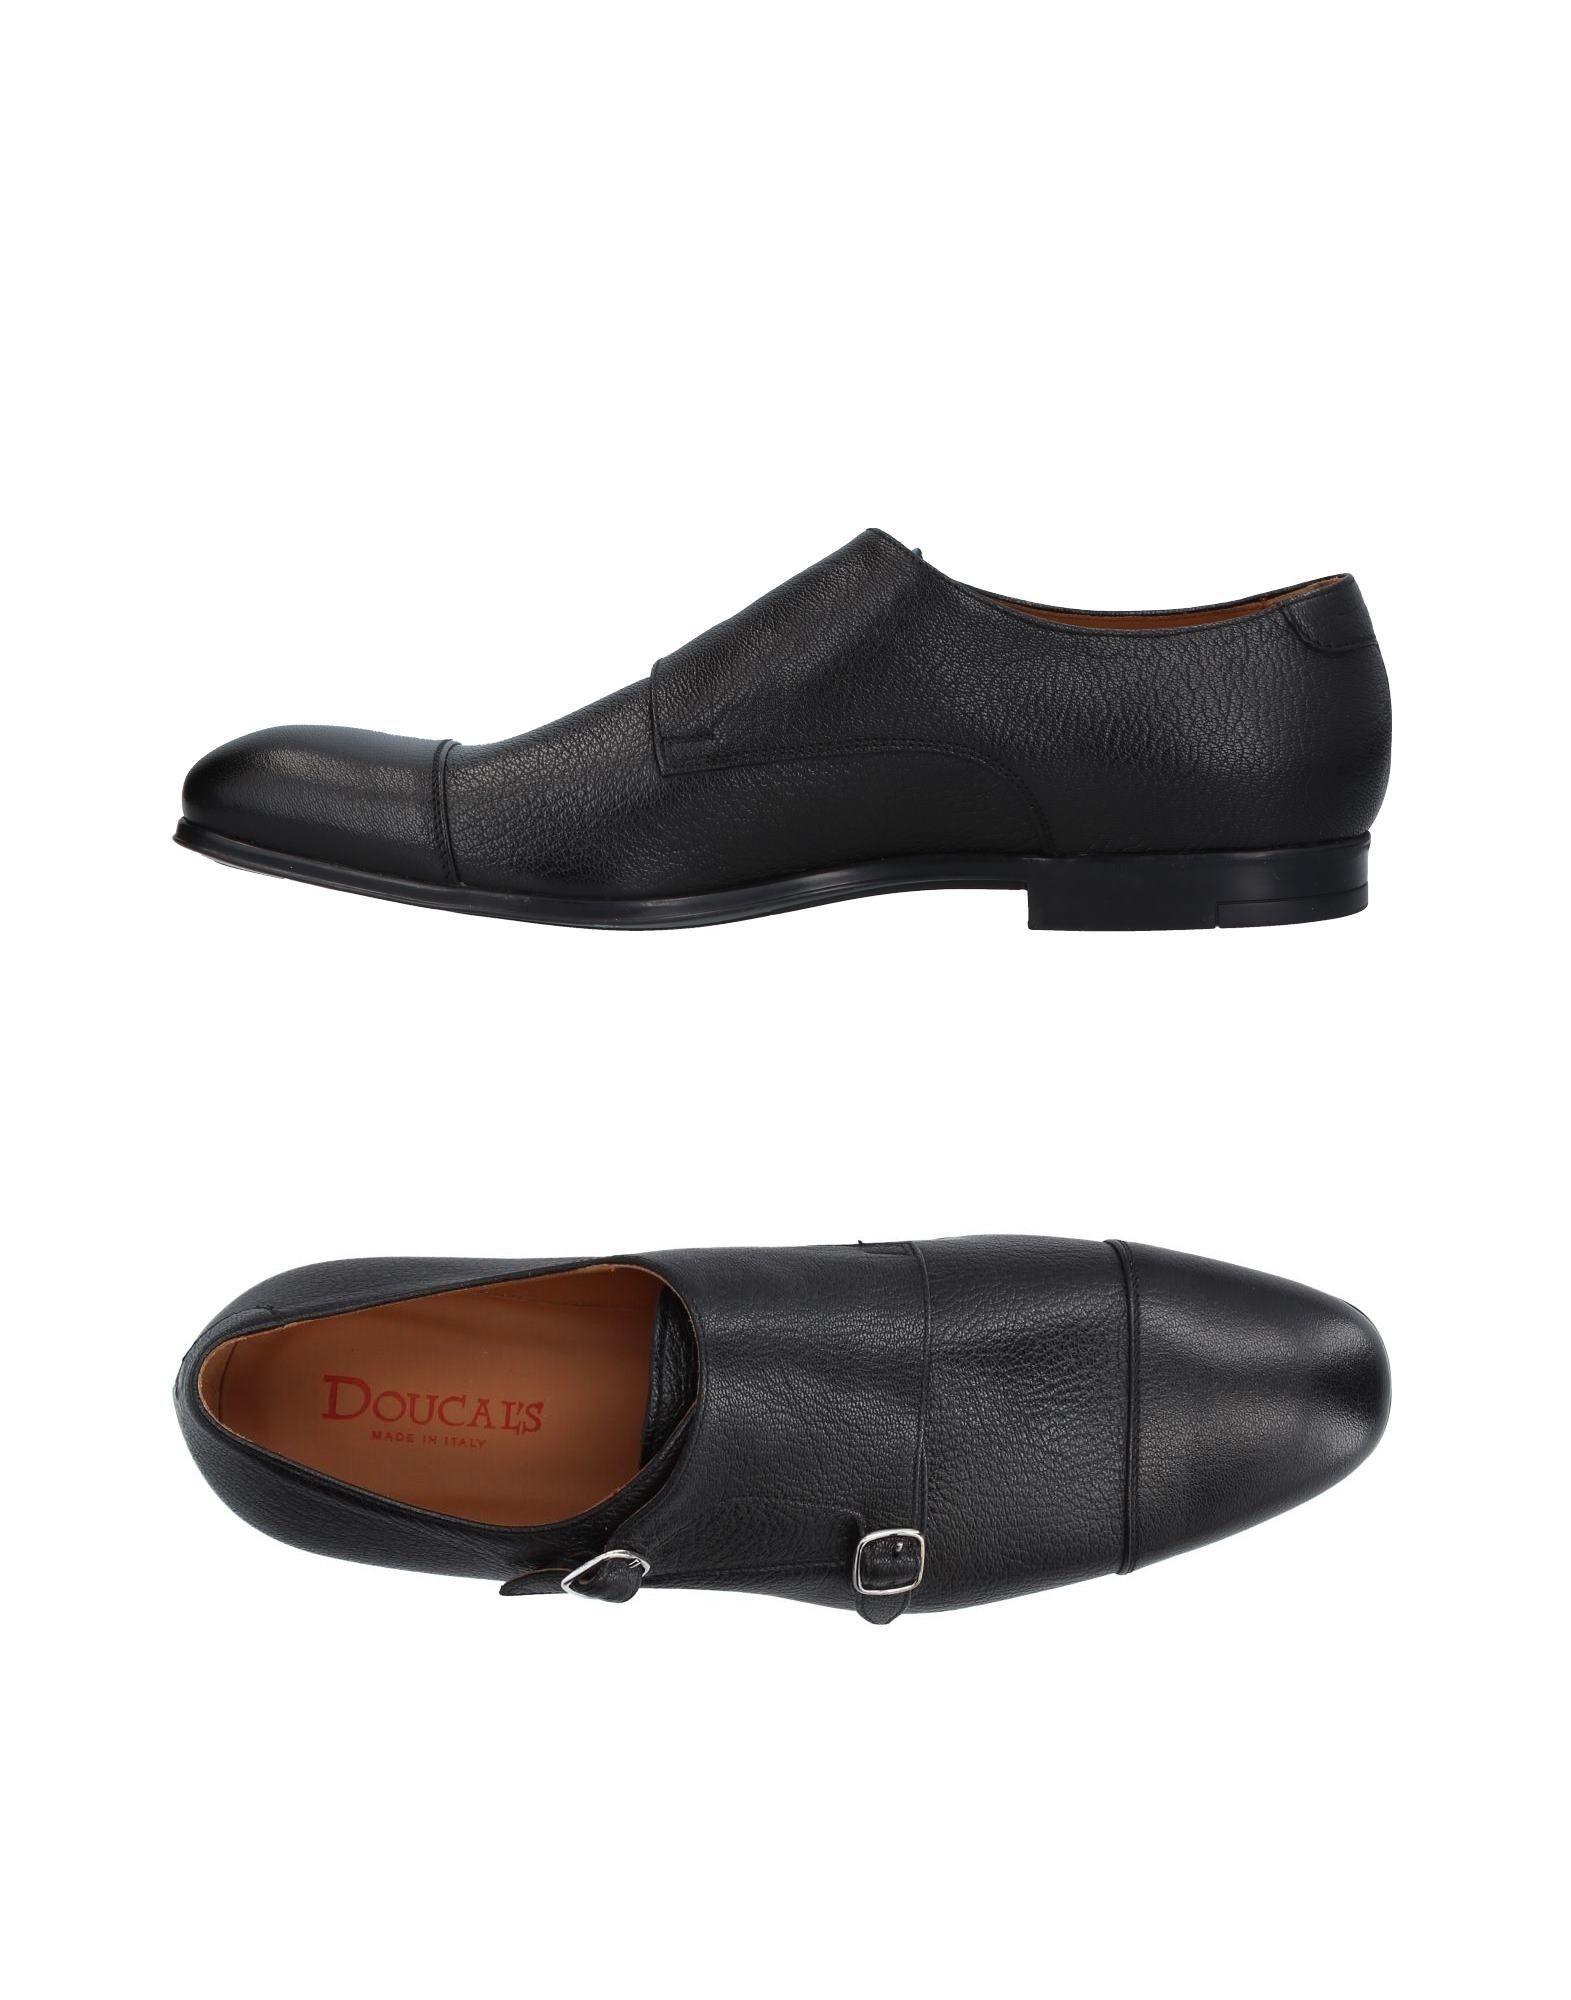 DOUCAL´S Herren Mokassin Farbe Schwarz Größe 9 jetztbilligerkaufen